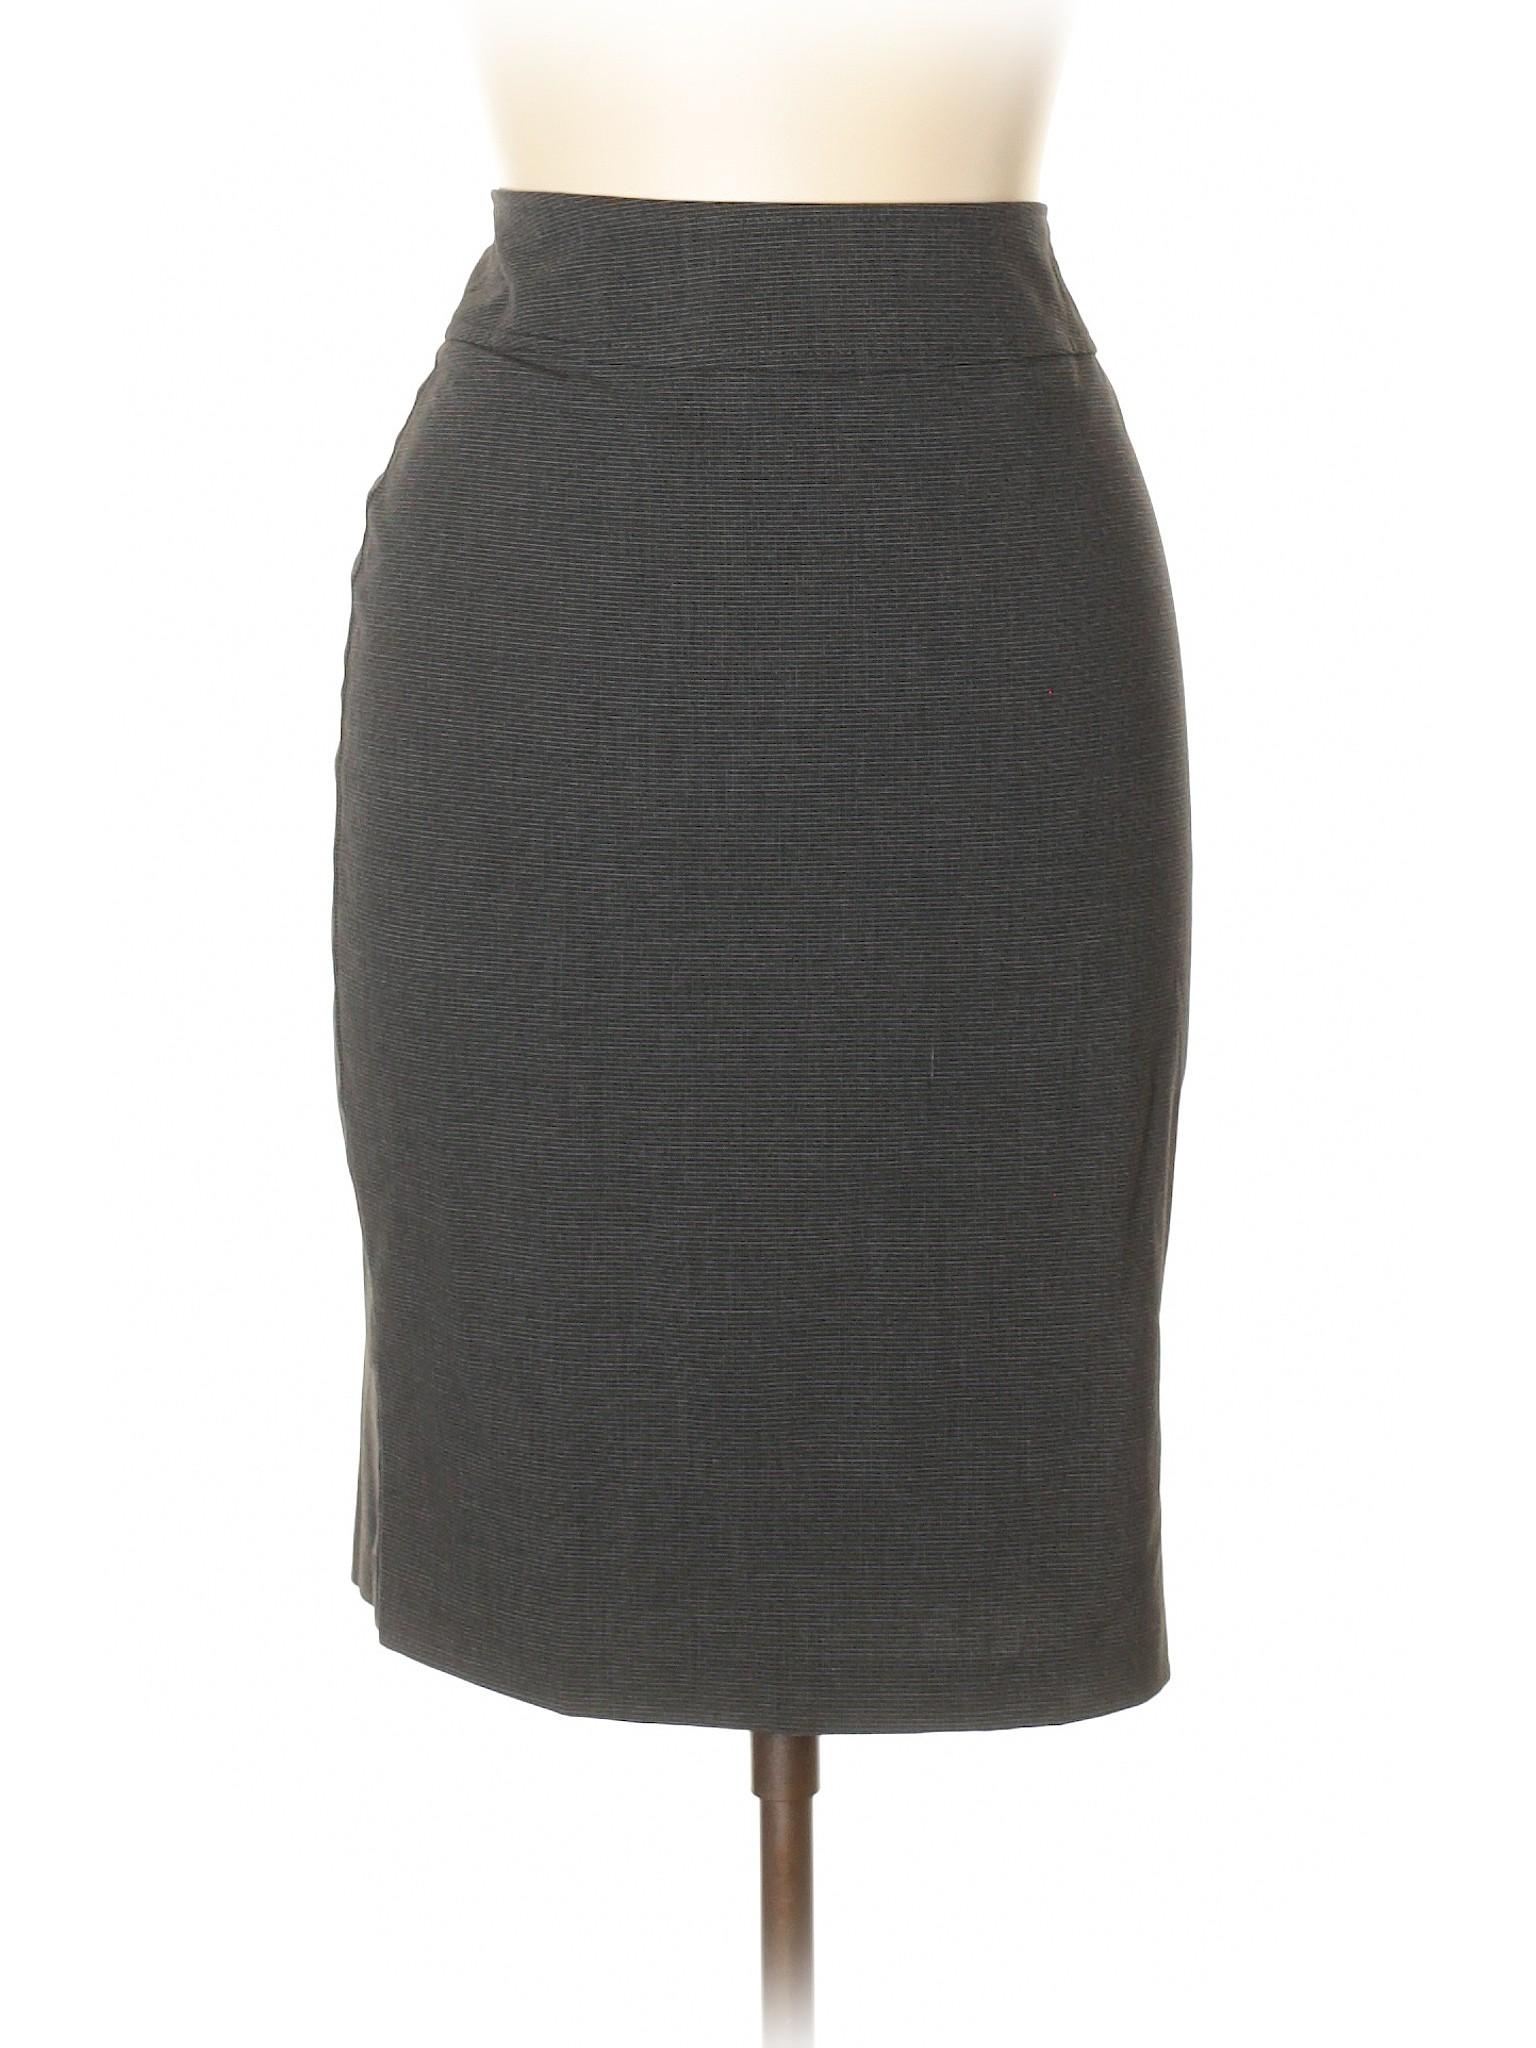 Casual leisure Skirt Skirt Boutique leisure Beloved leisure Casual Boutique Boutique Beloved Casual Beloved PRq76U